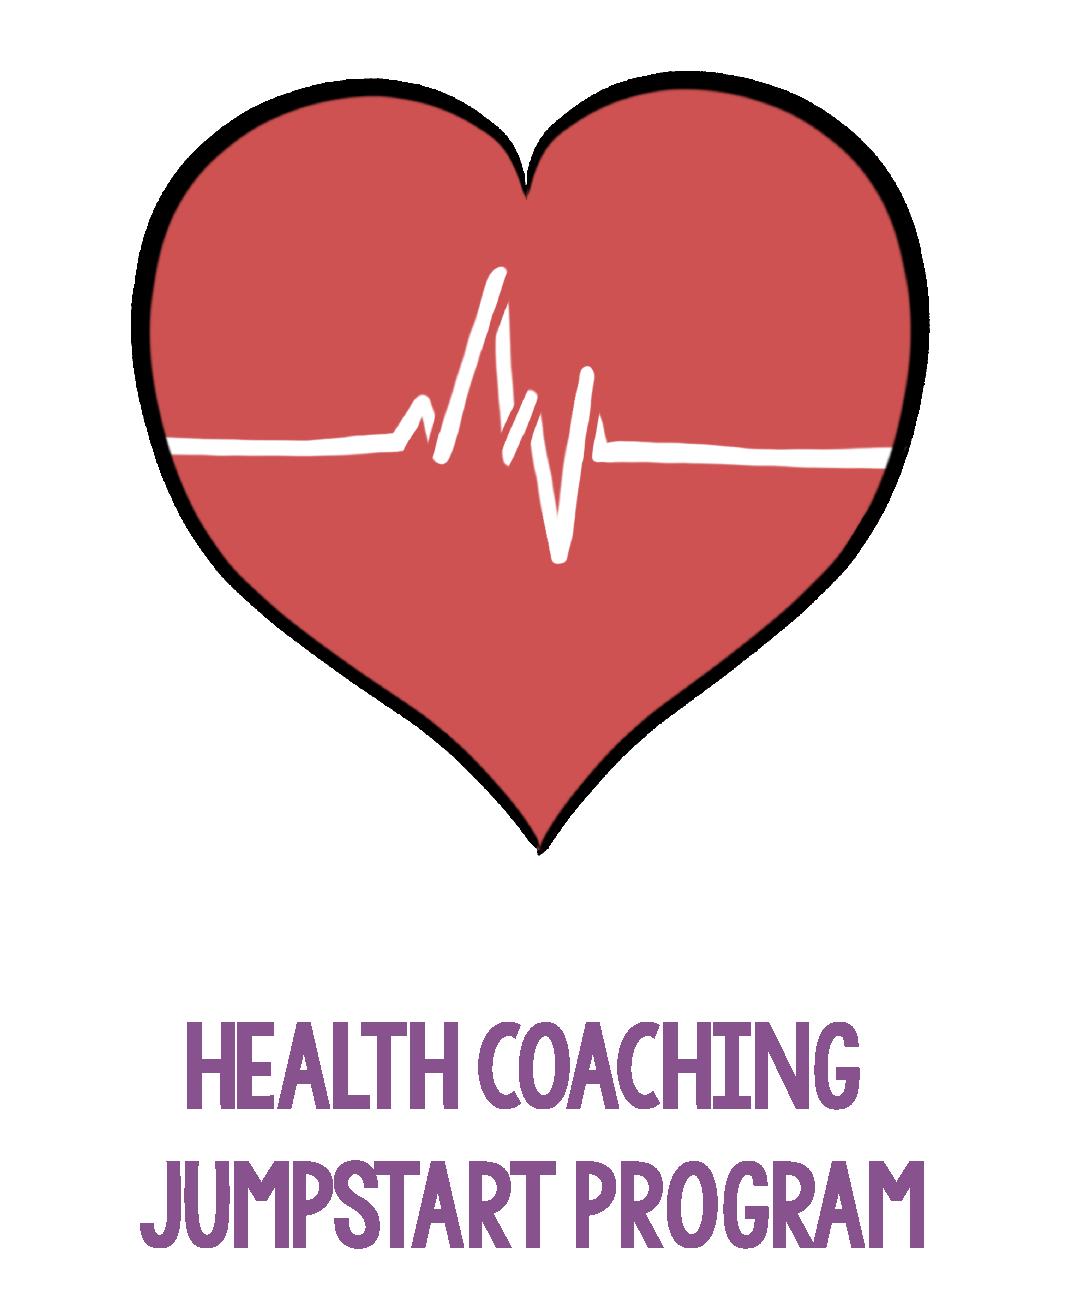 HEALTH COACHING JUMPSTART PROGRAM.png